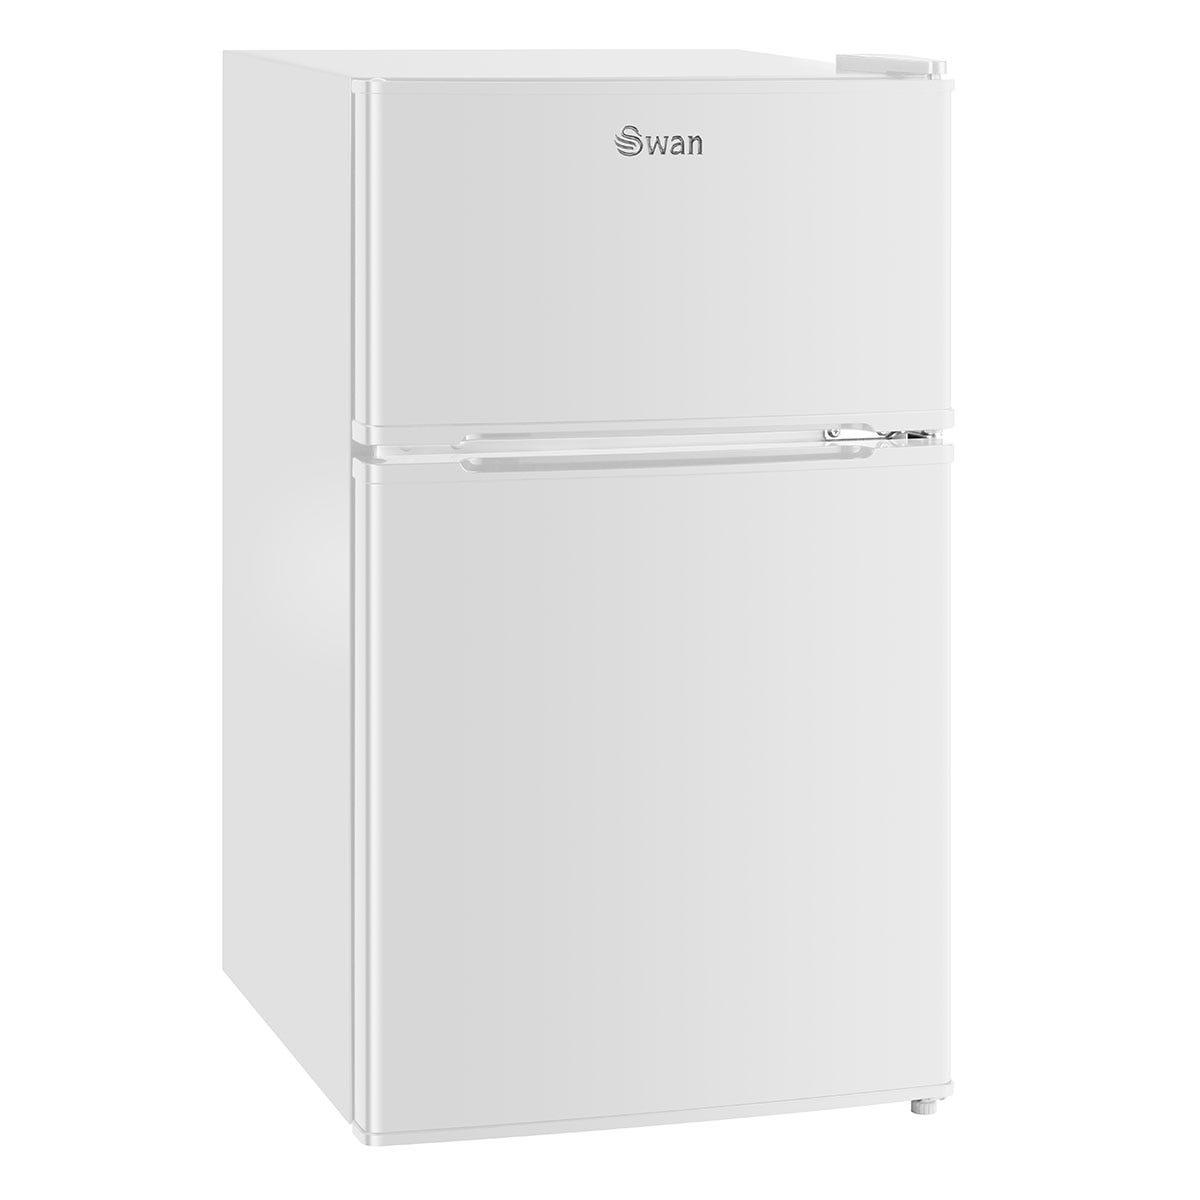 Swan SR75040WHTN 87L Under-Counter Fridge Freezer - White